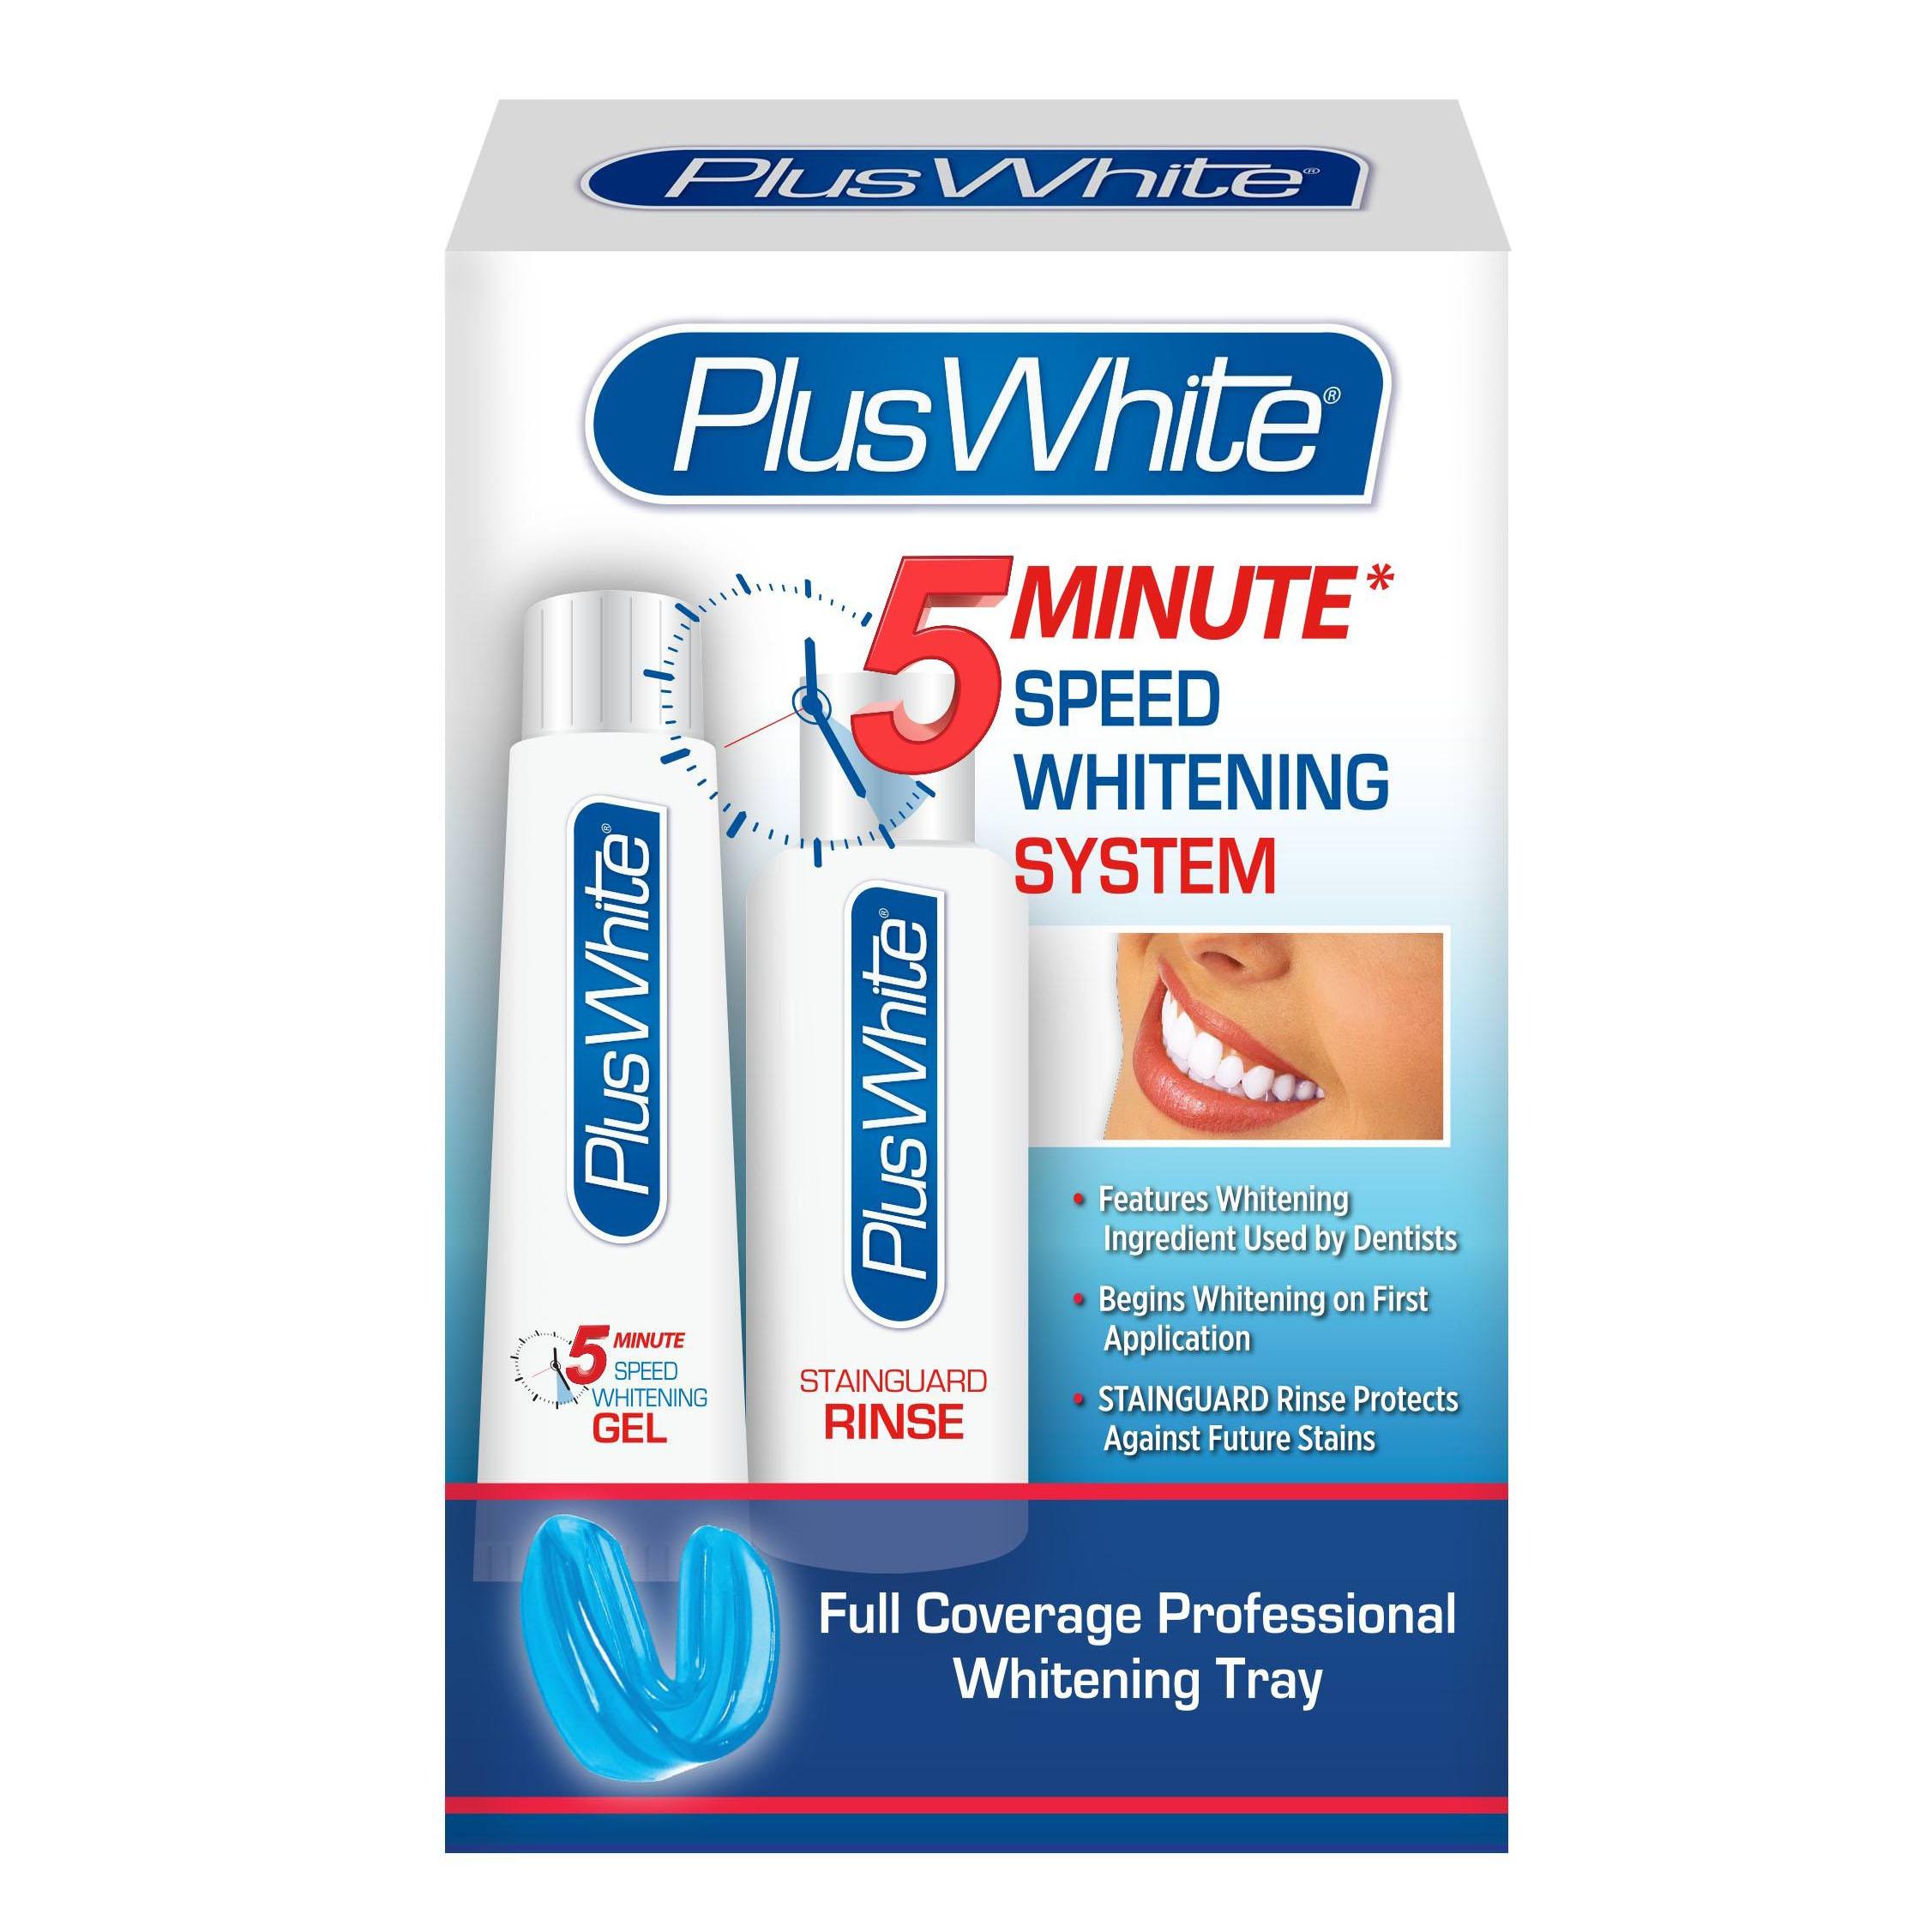 Plus White 5 Minute Premier Speed Teeth Whitening System